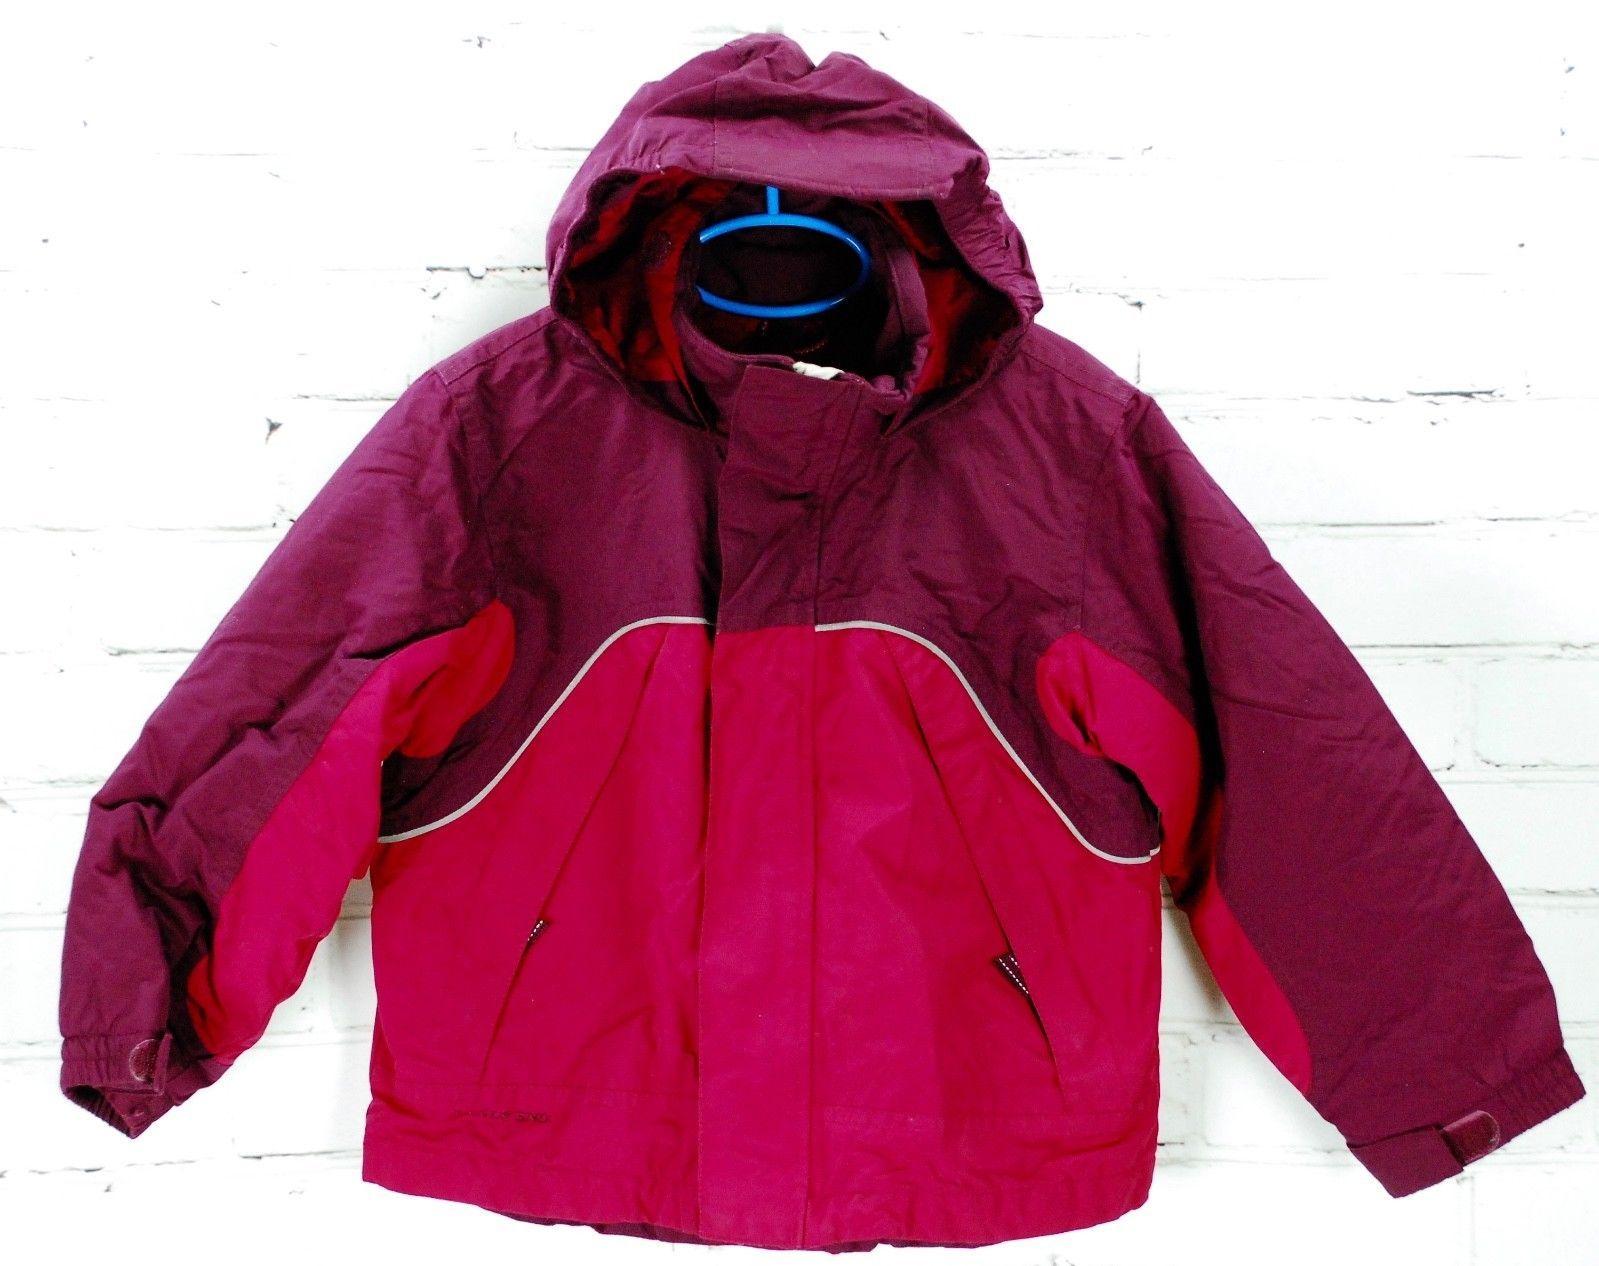 2c9fb9ba8 Lands' End Kids Squall Jacket Winter Coat and 19 similar items